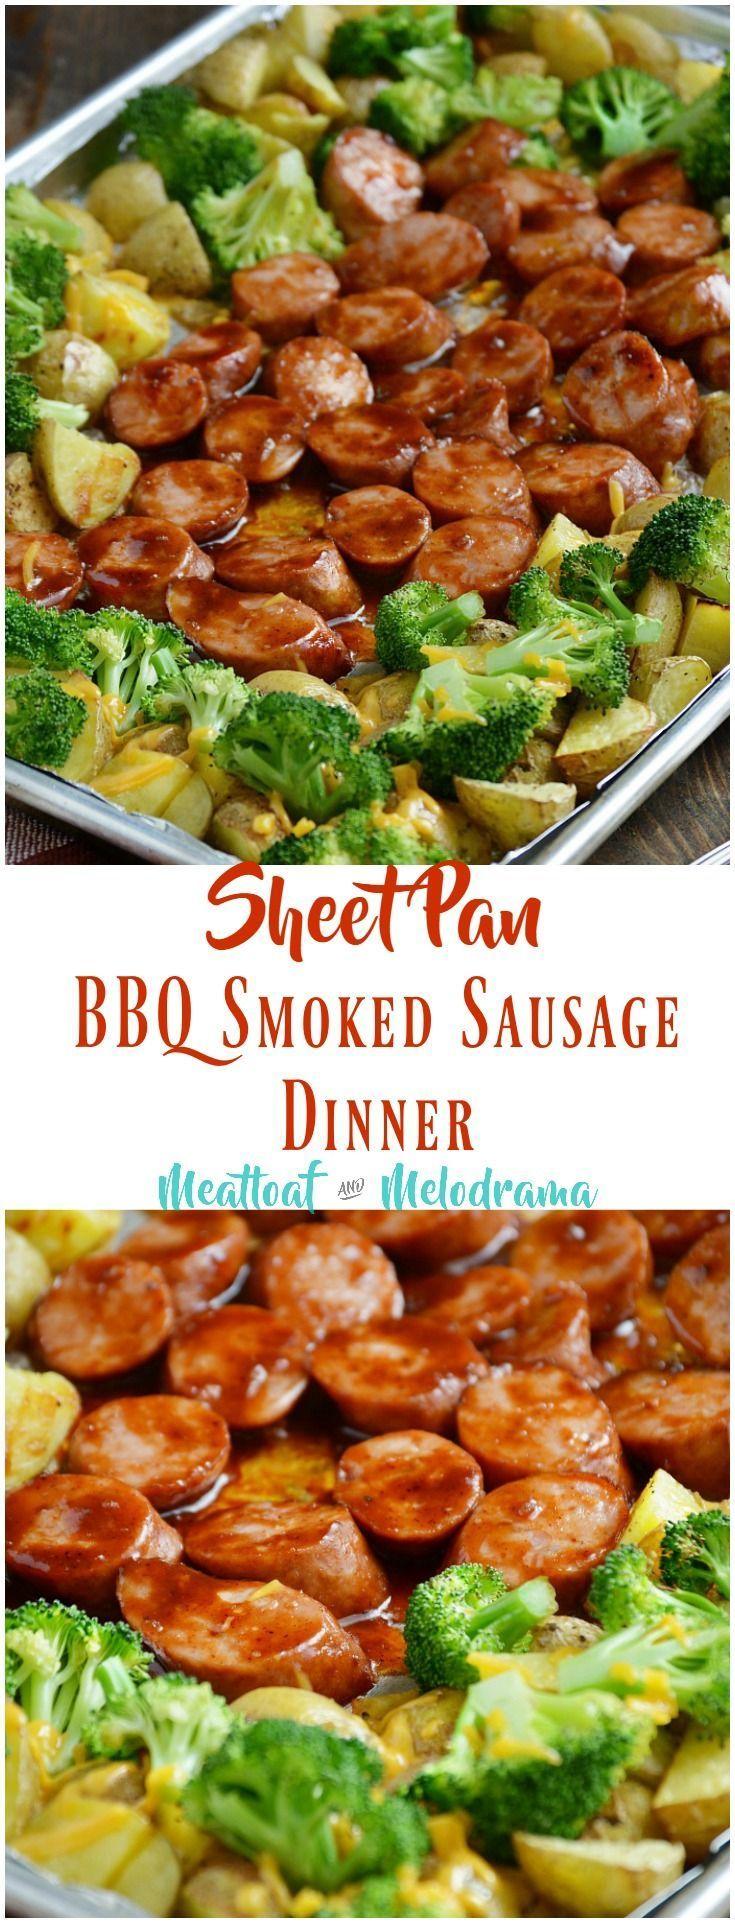 Sheet Pan BBQ Smoked Sausage Dinner #sausagedinner